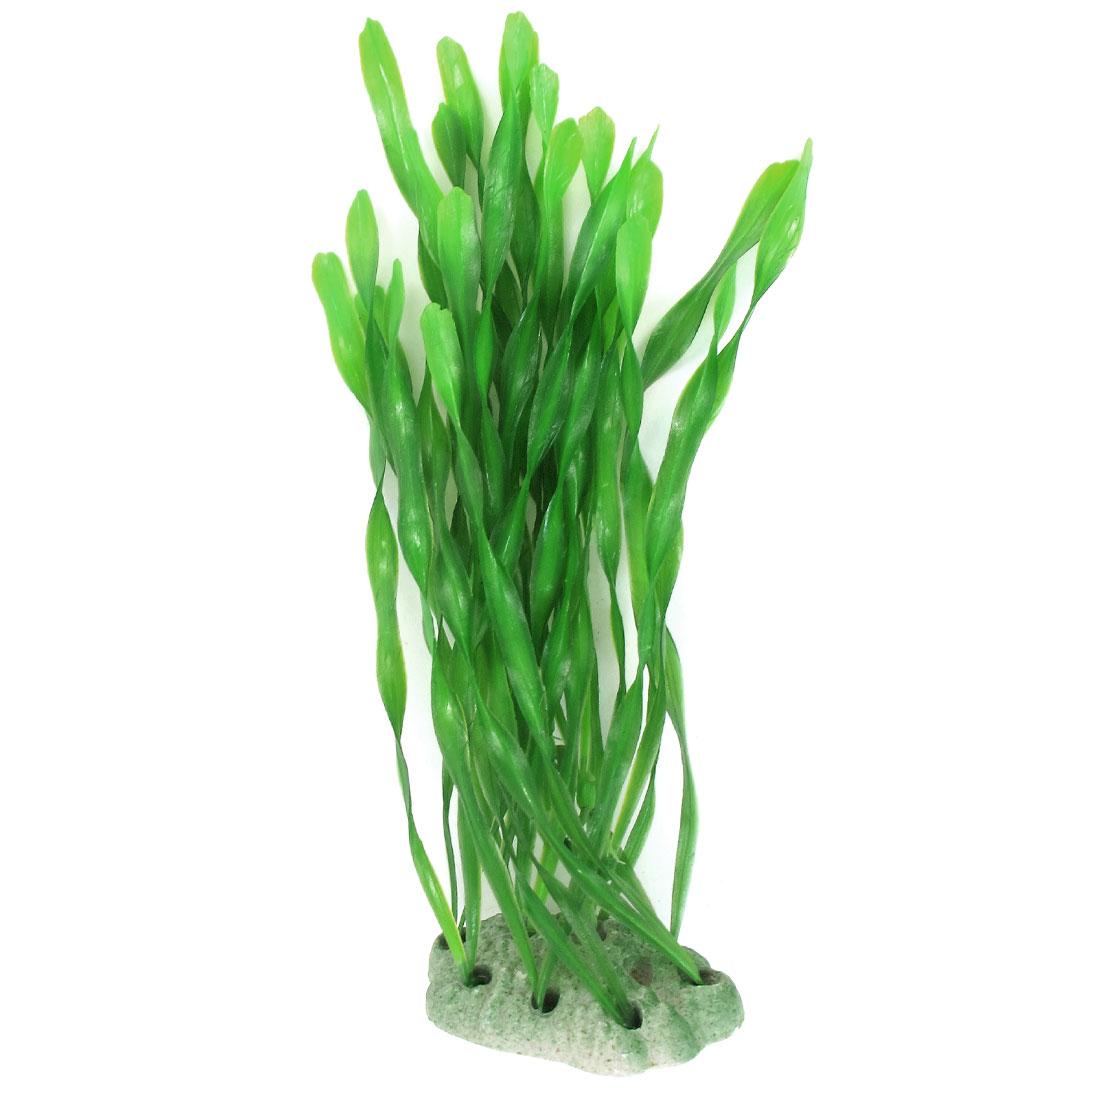 "Green Emulational Aquarium Grass Water Plant Adorn 8.3"" Height for Fish Tank"